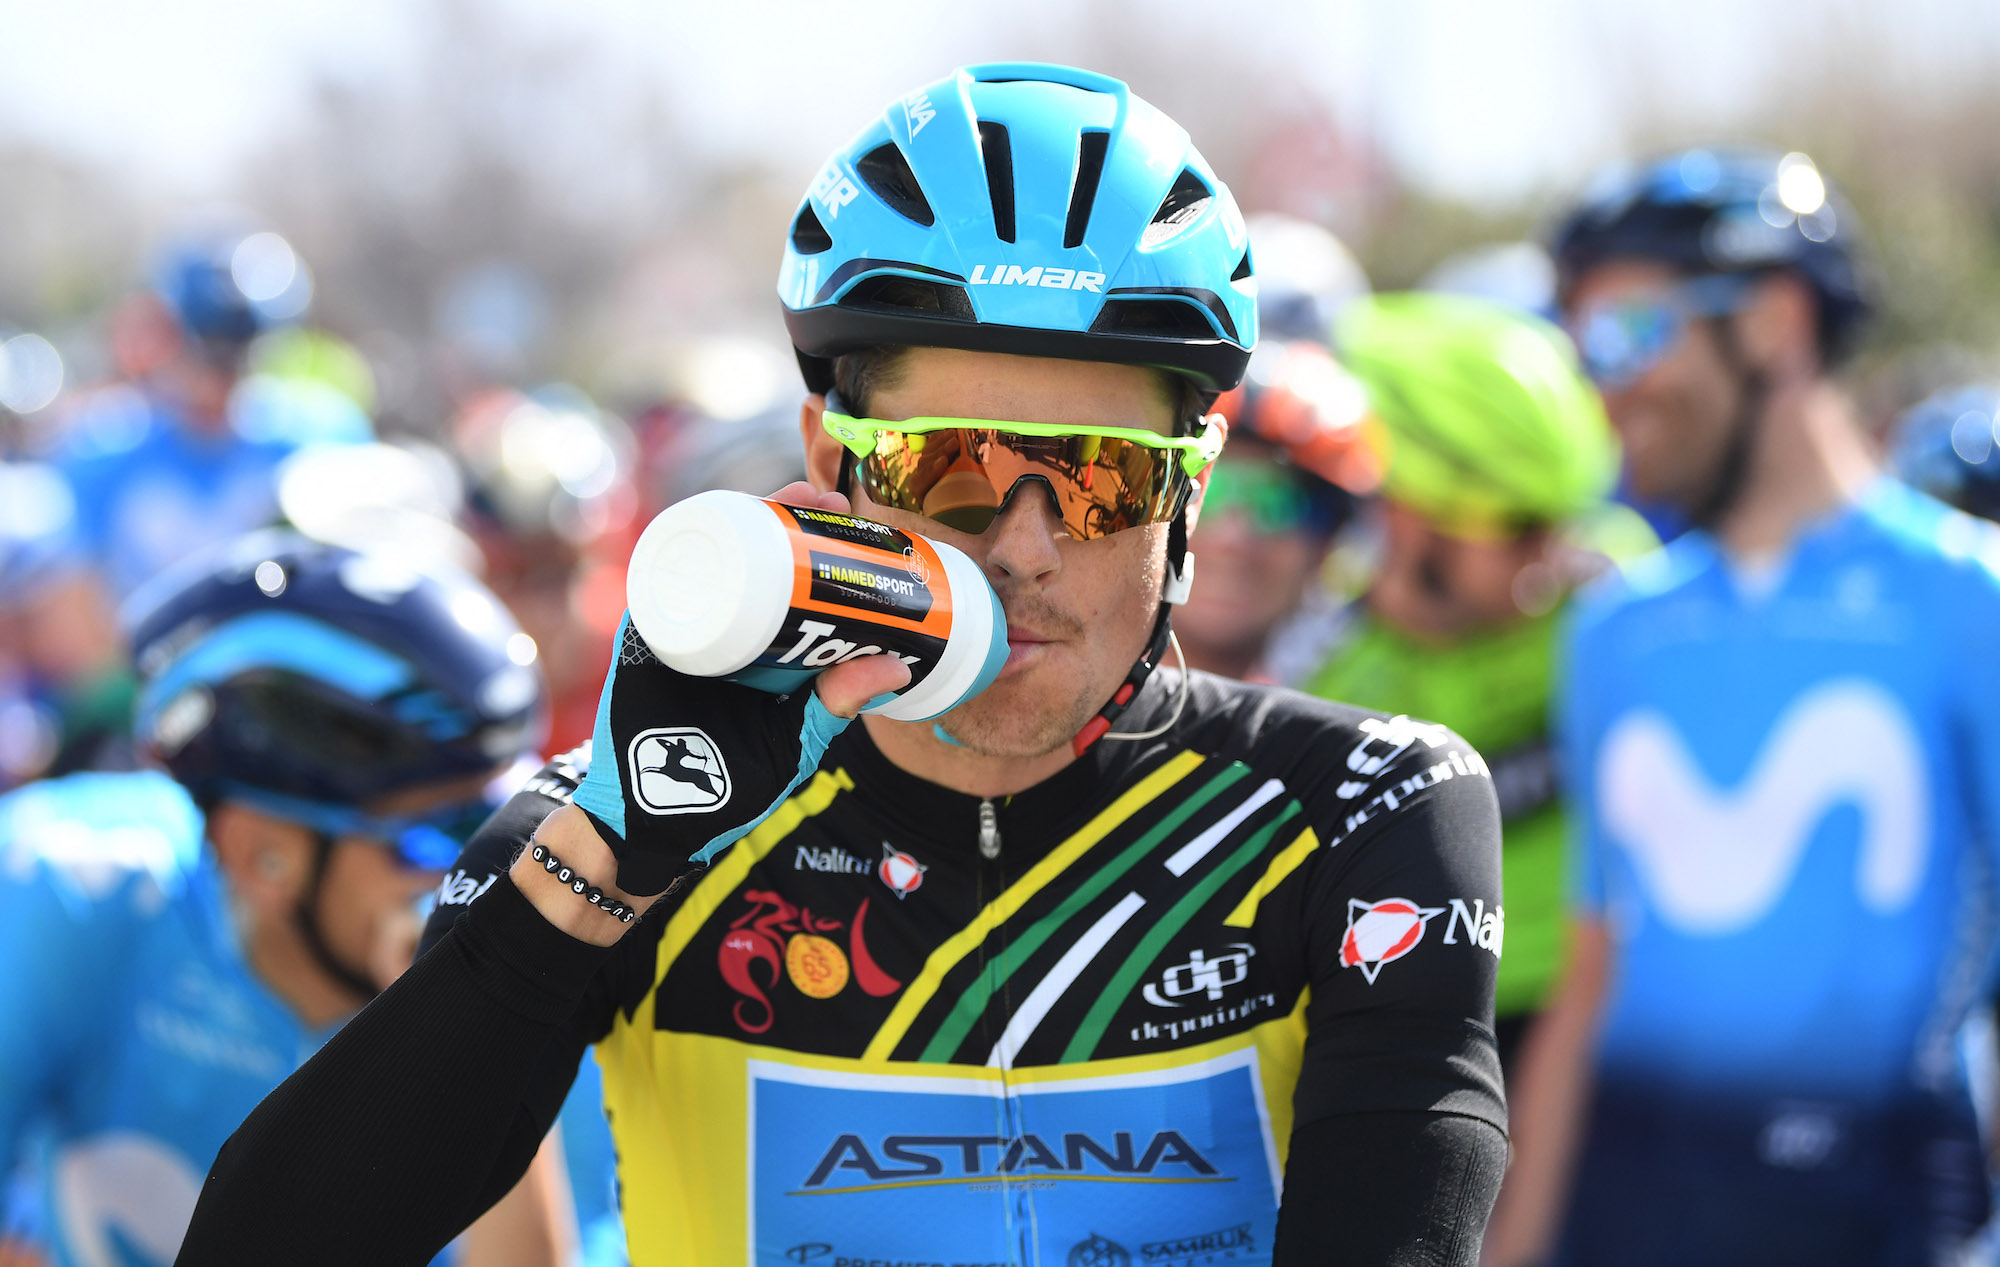 Ruta del Sol 2020 start list - Cycling Weekly